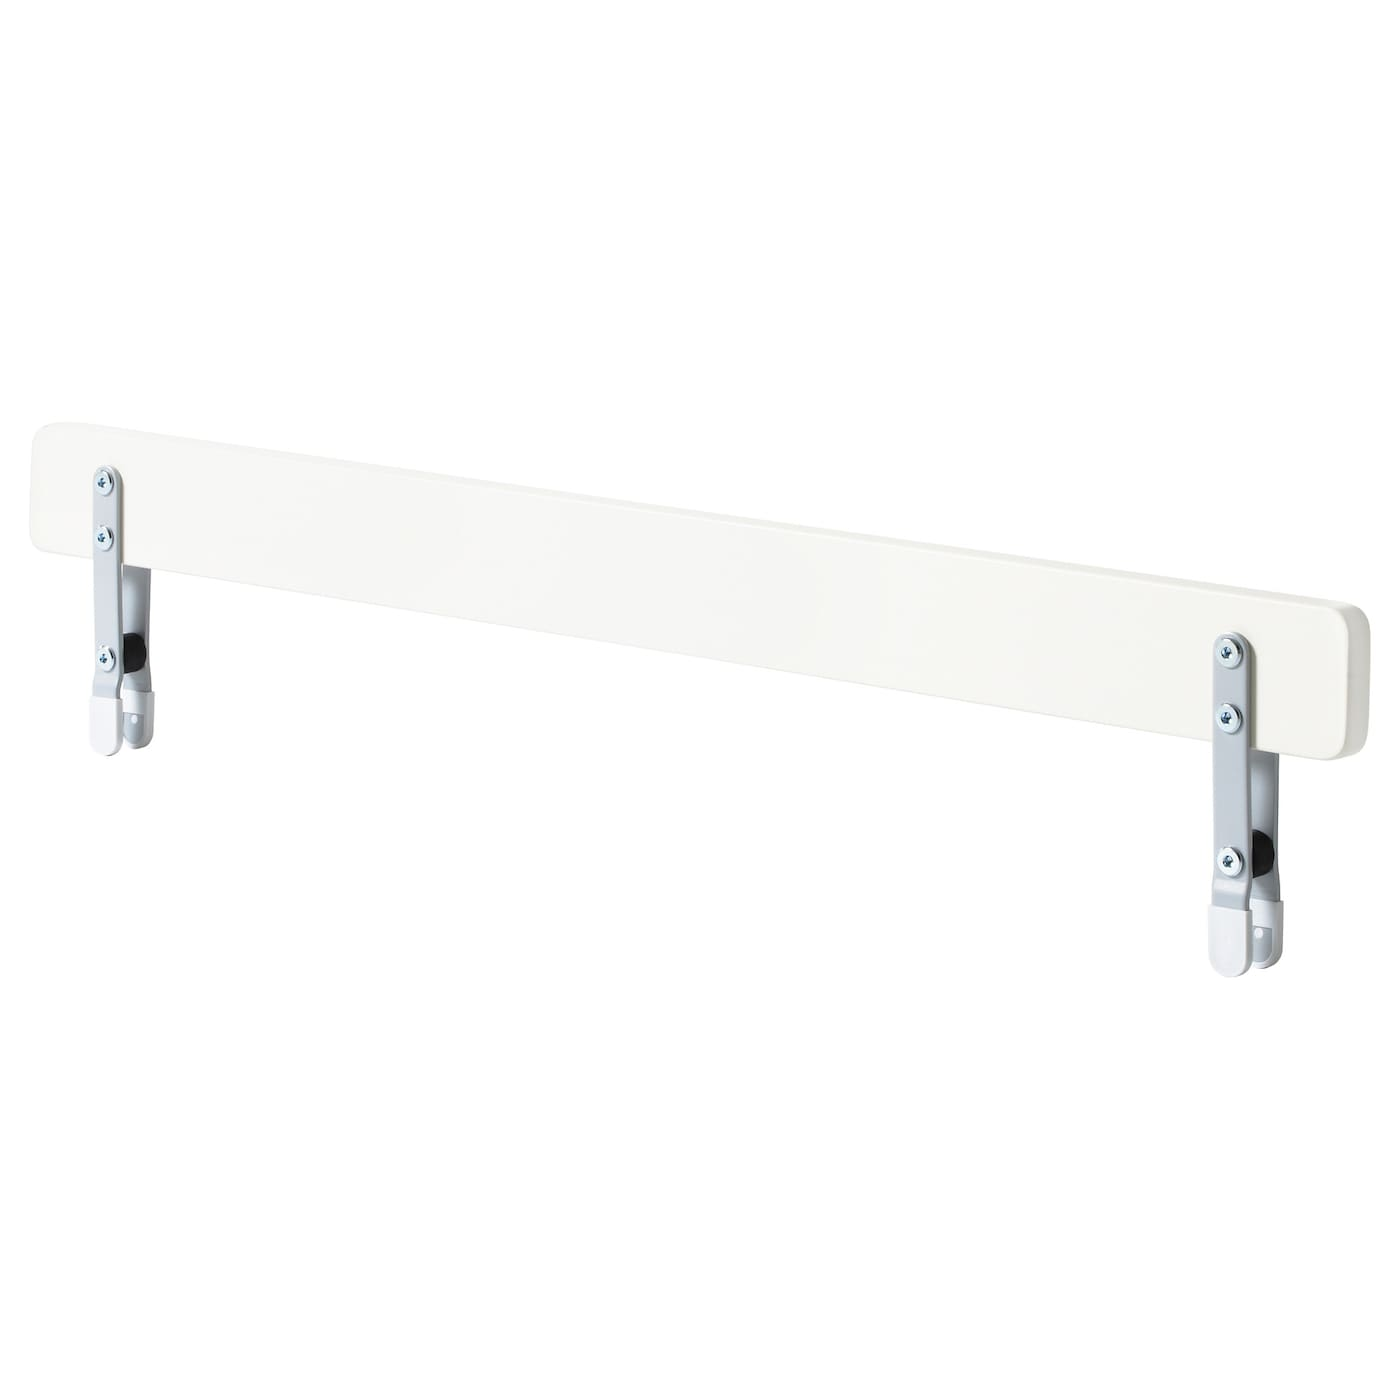 vikare guard rail white ikea. Black Bedroom Furniture Sets. Home Design Ideas